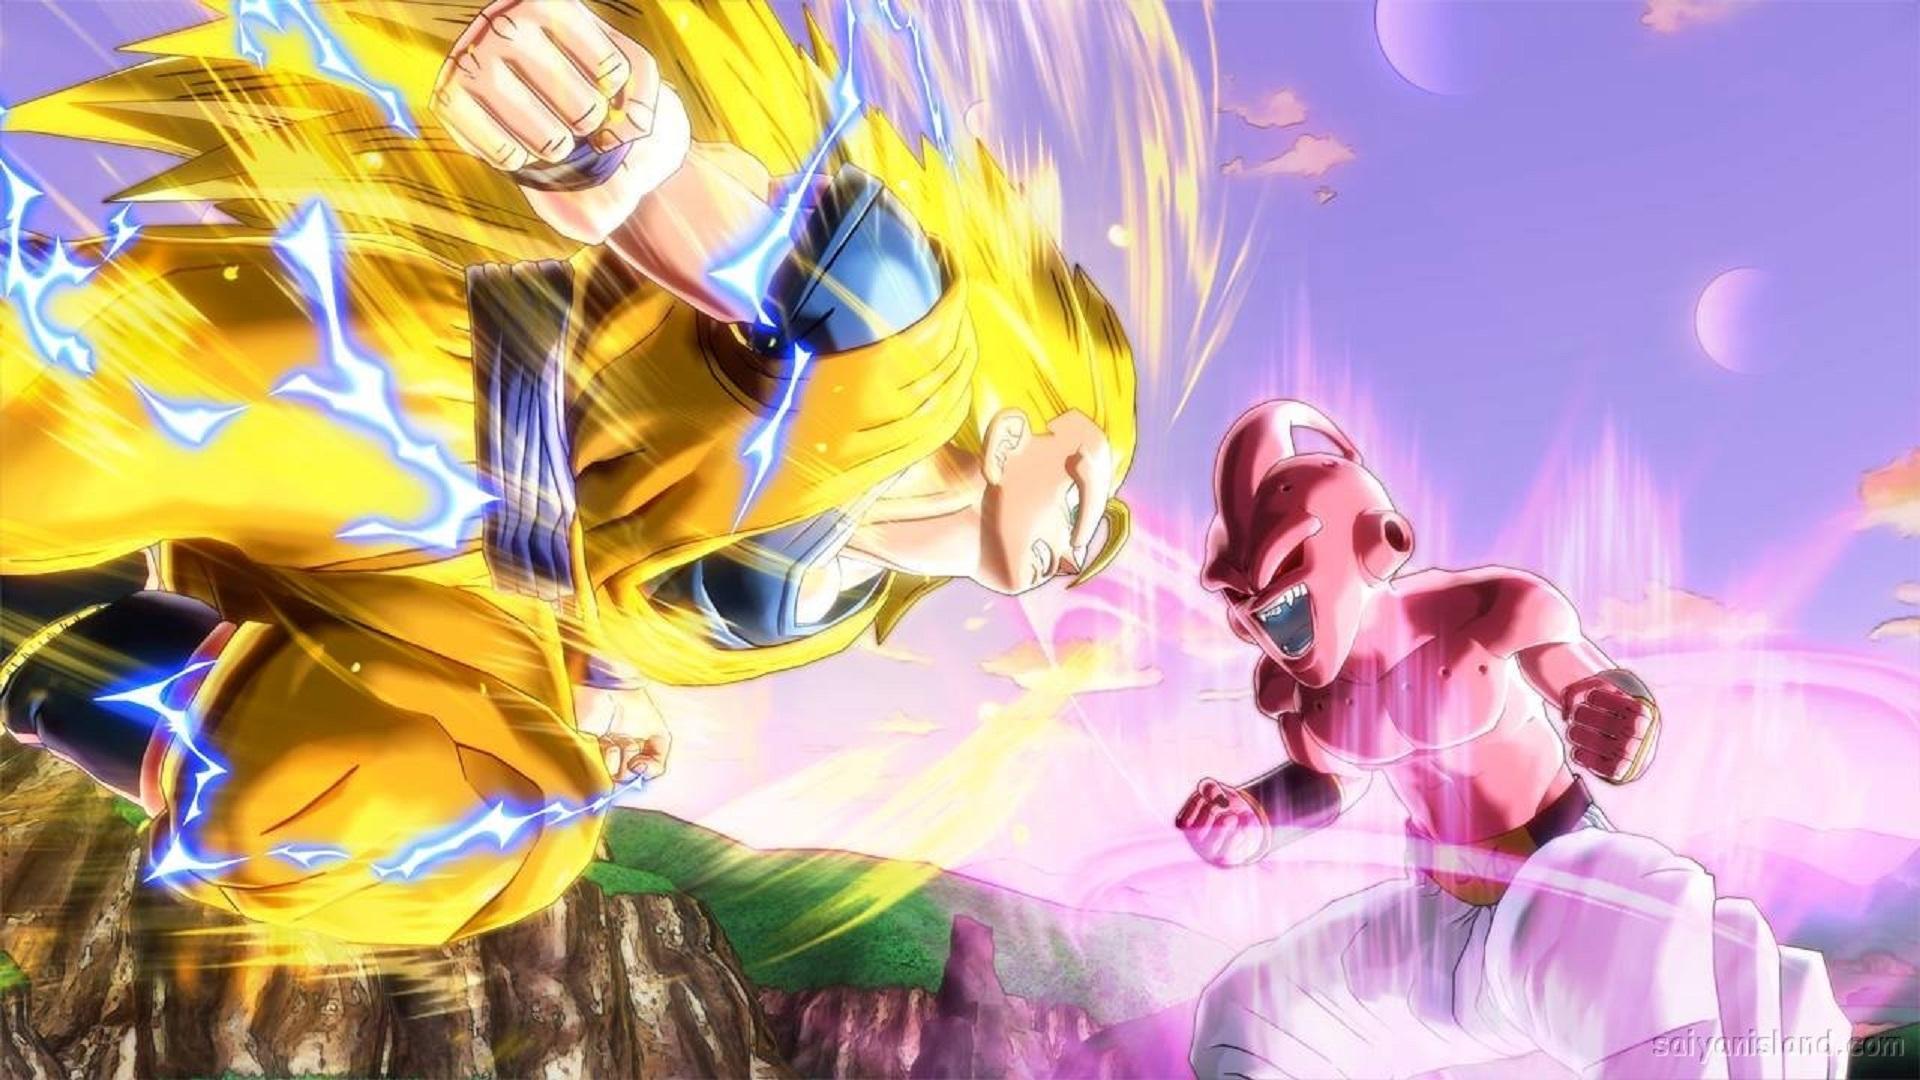 Dragon Ball Xenoverse Wallpaper Goku vs Majin Boo Showdown